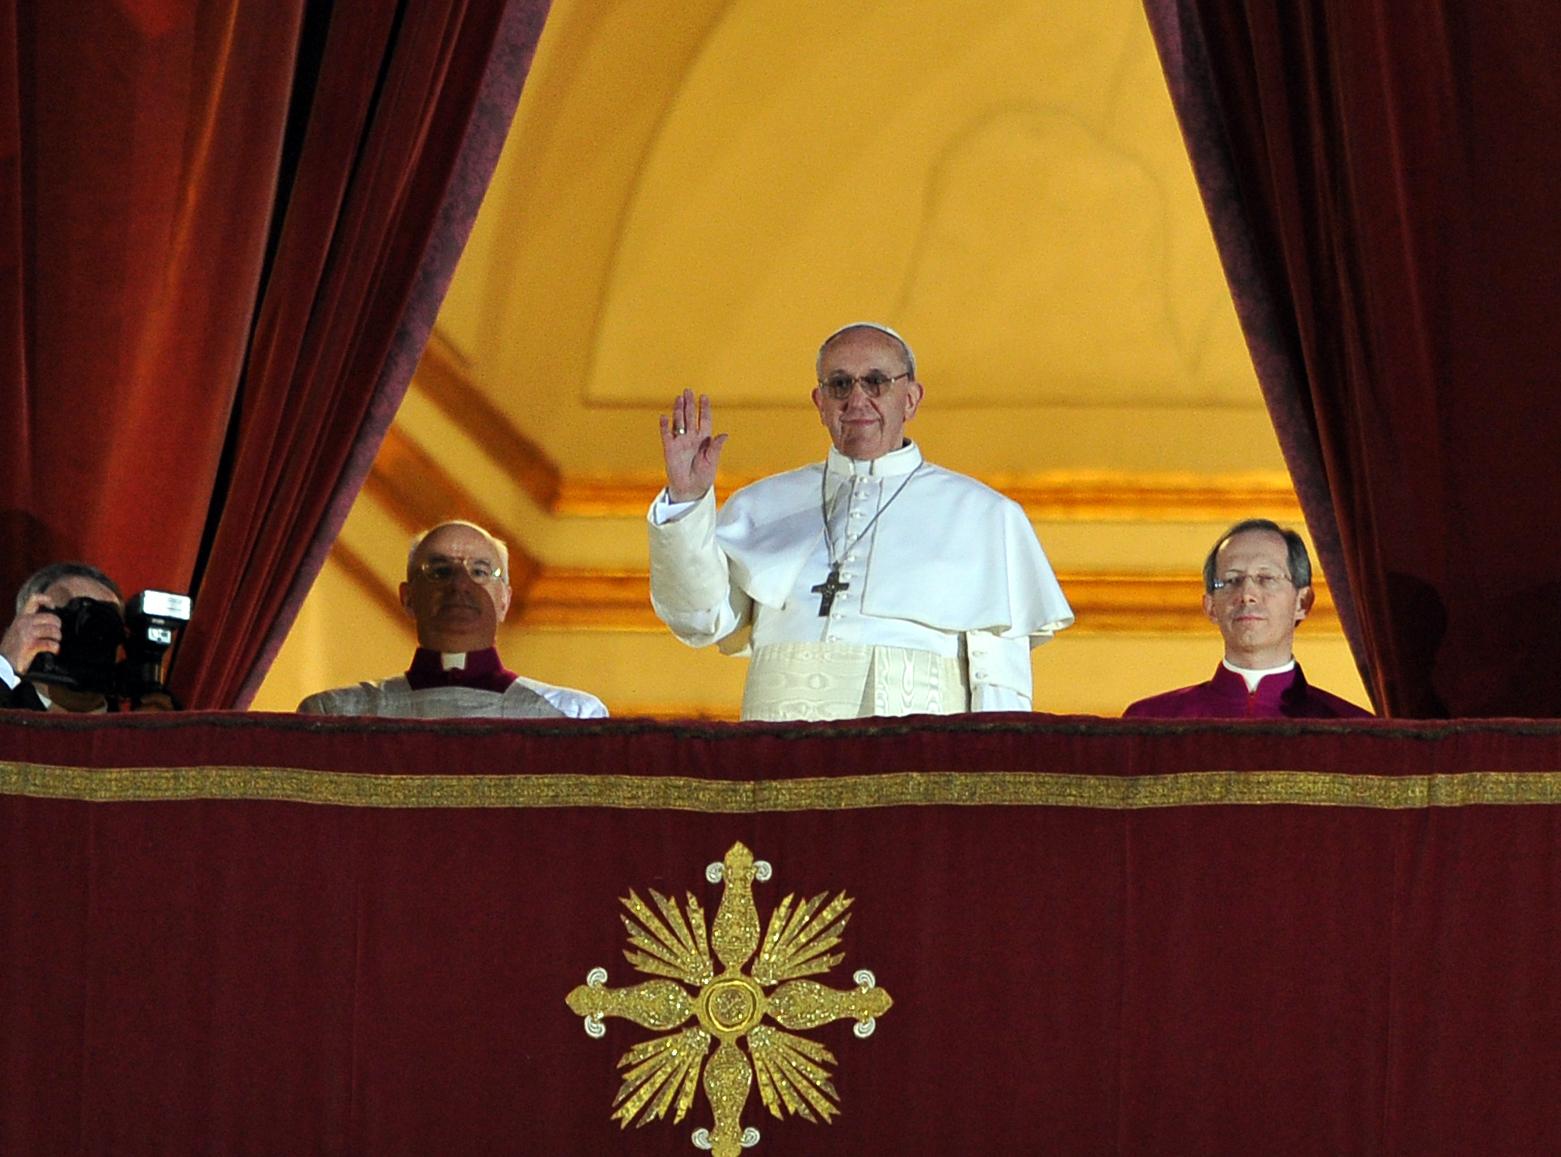 Papa Francesco (Jorge Mario Bergoglio)